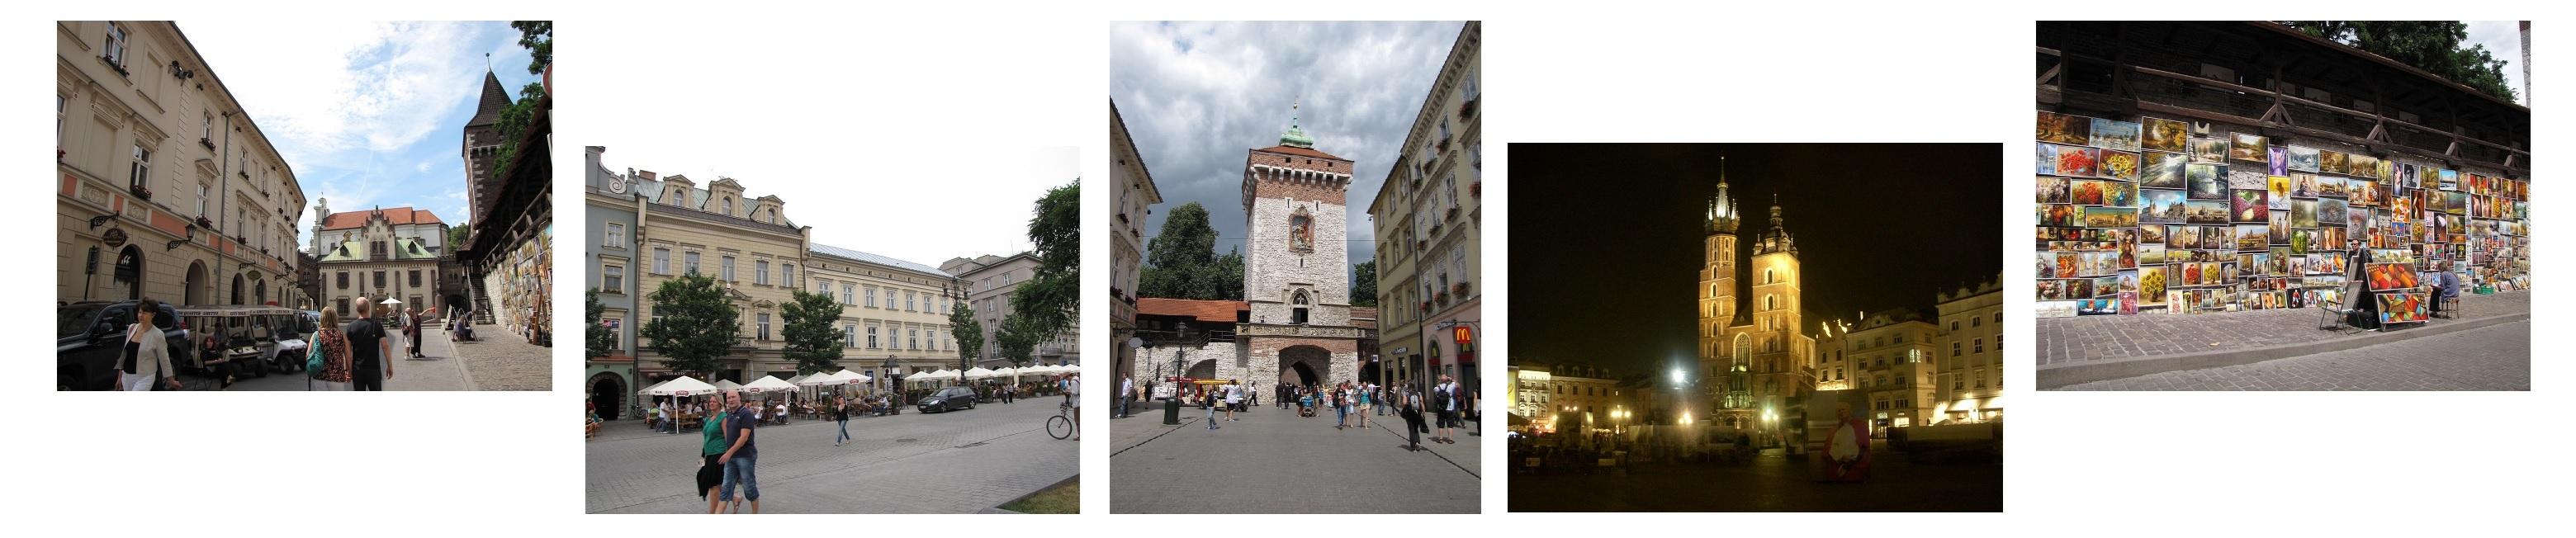 TEFL Nomads on the Road: Krakow